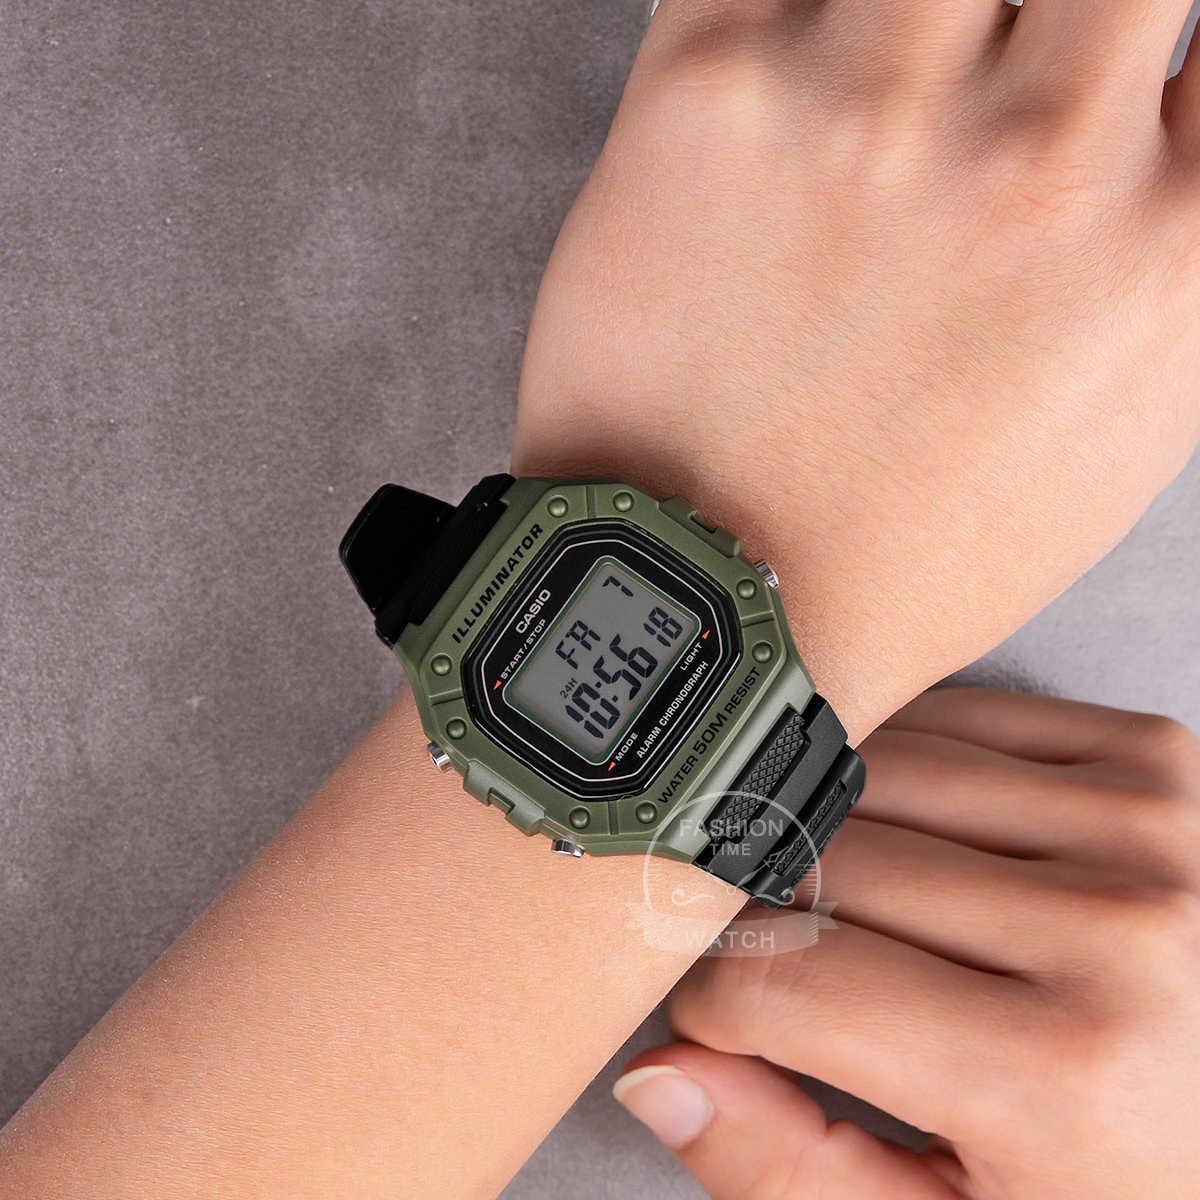 Casio นาฬิกา G ช็อกนาฬิกาชายยอดนิยมแบรนด์หรูชุดทหาร LED Relógioนาฬิกาดิจิตอลกีฬา 50 เมตรกันน้ำควอตซ์ผู้ชายนาฬิกานาฬิกาย้อนยุคตารางที่เรียบง่ายนาฬิกาสีดำสบาย ๆ คลาสสิกนาฬิกาข้อมือนาฬิกา relogio masculino reloj hombre